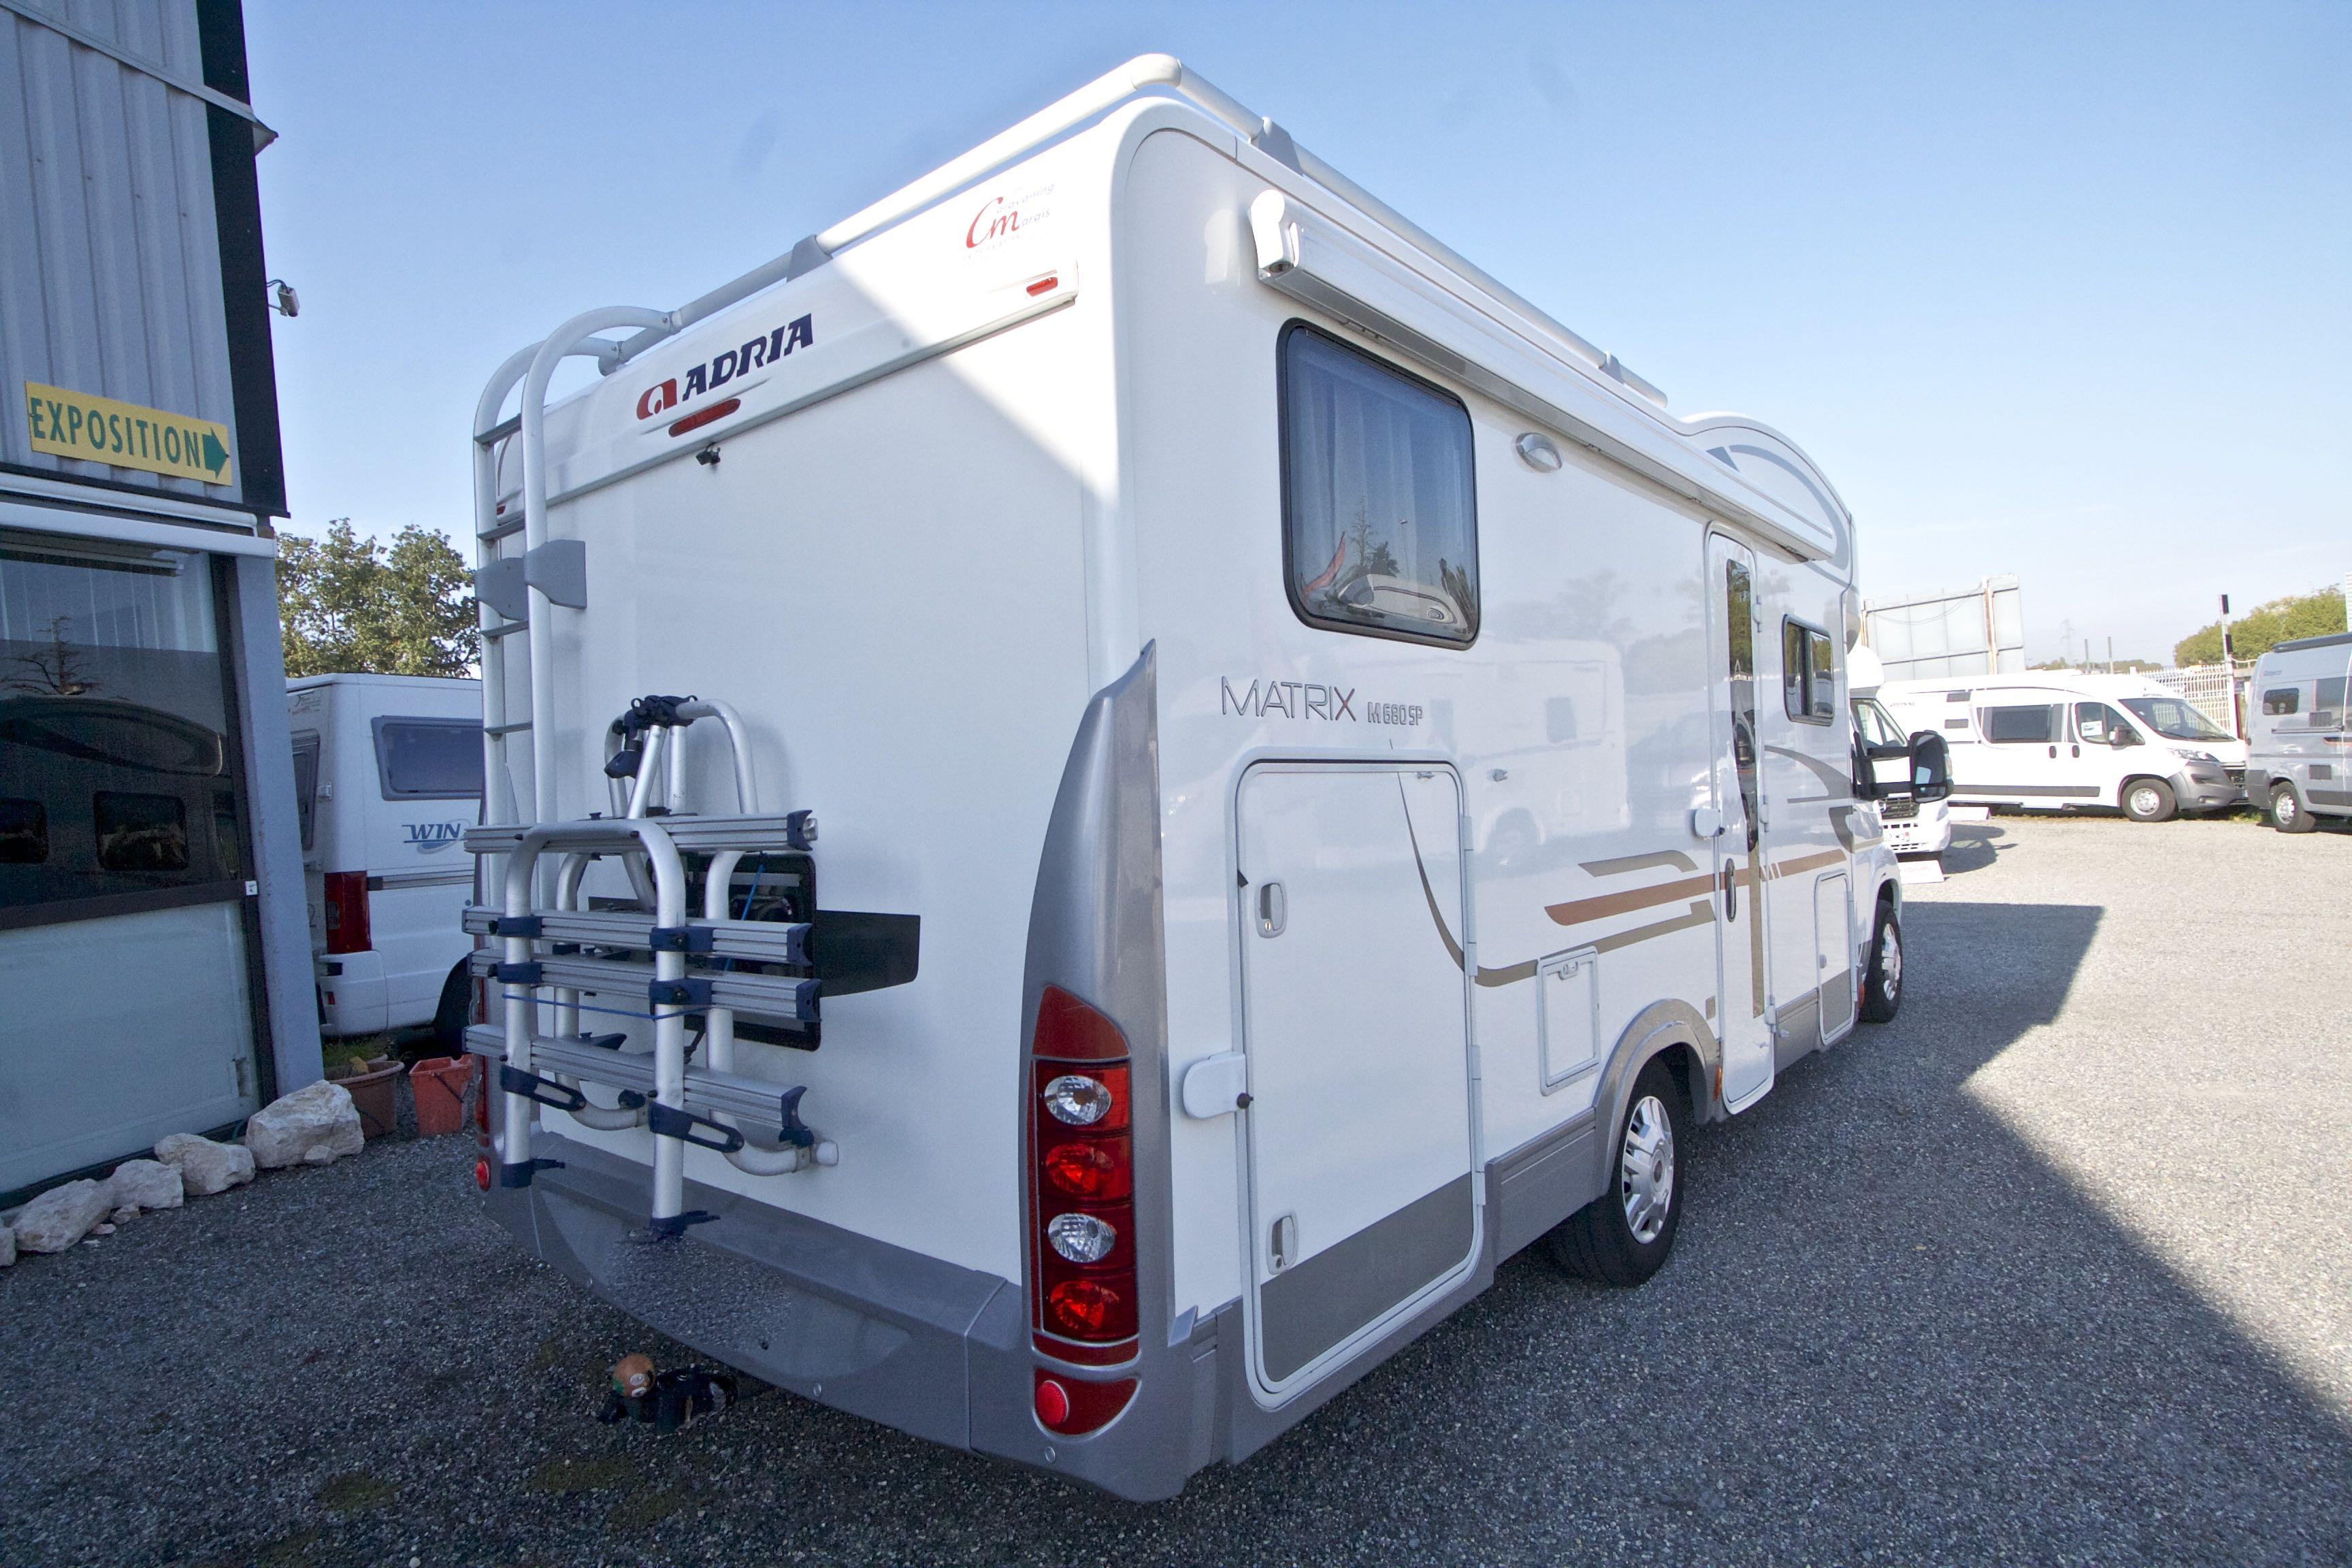 adria 680 sp occasion porteur fiat ducato 2 3l 130 cv camping car vendre en haute garonne 31. Black Bedroom Furniture Sets. Home Design Ideas